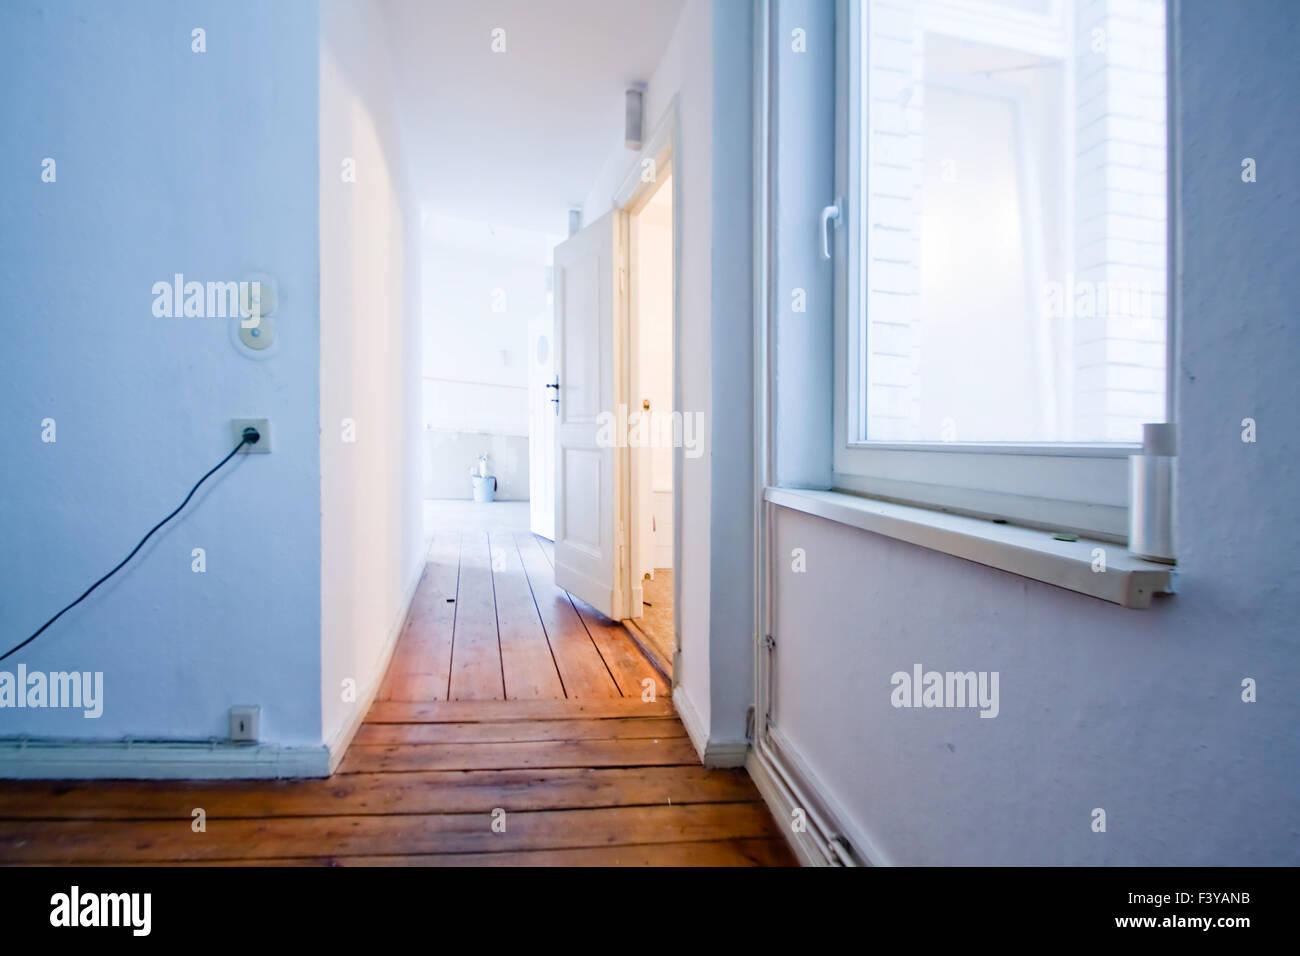 Habitation Immagini Stock